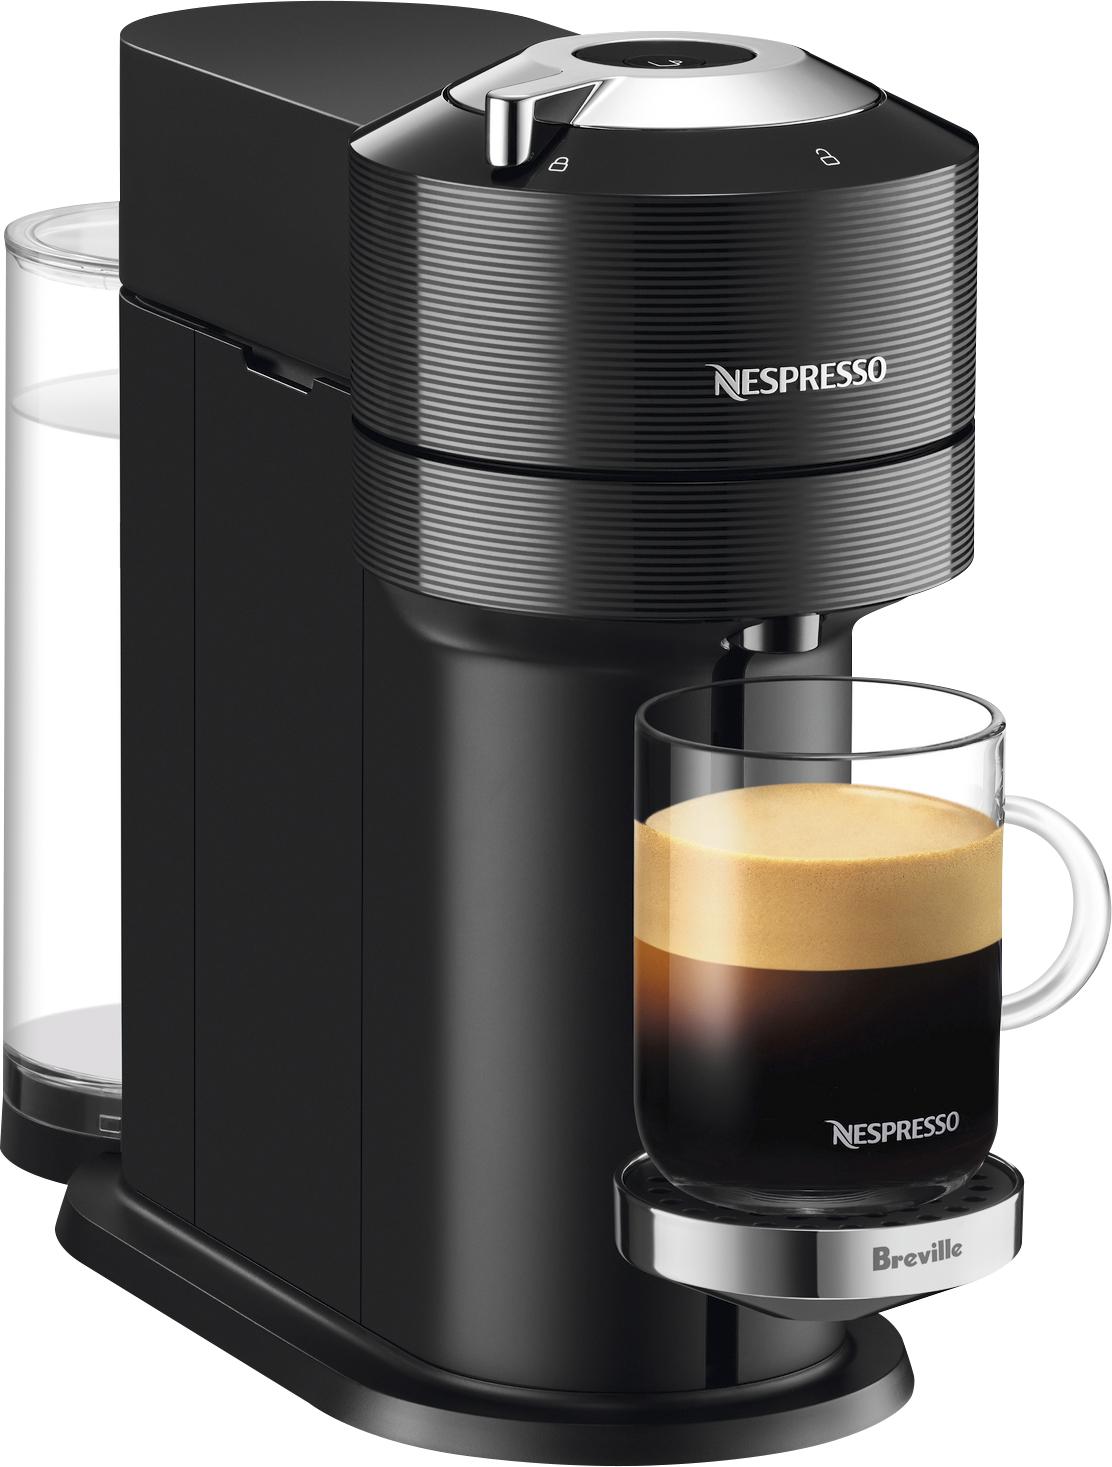 Best Buy: Up to 30% Off on Breville, Nespresso, & De ...